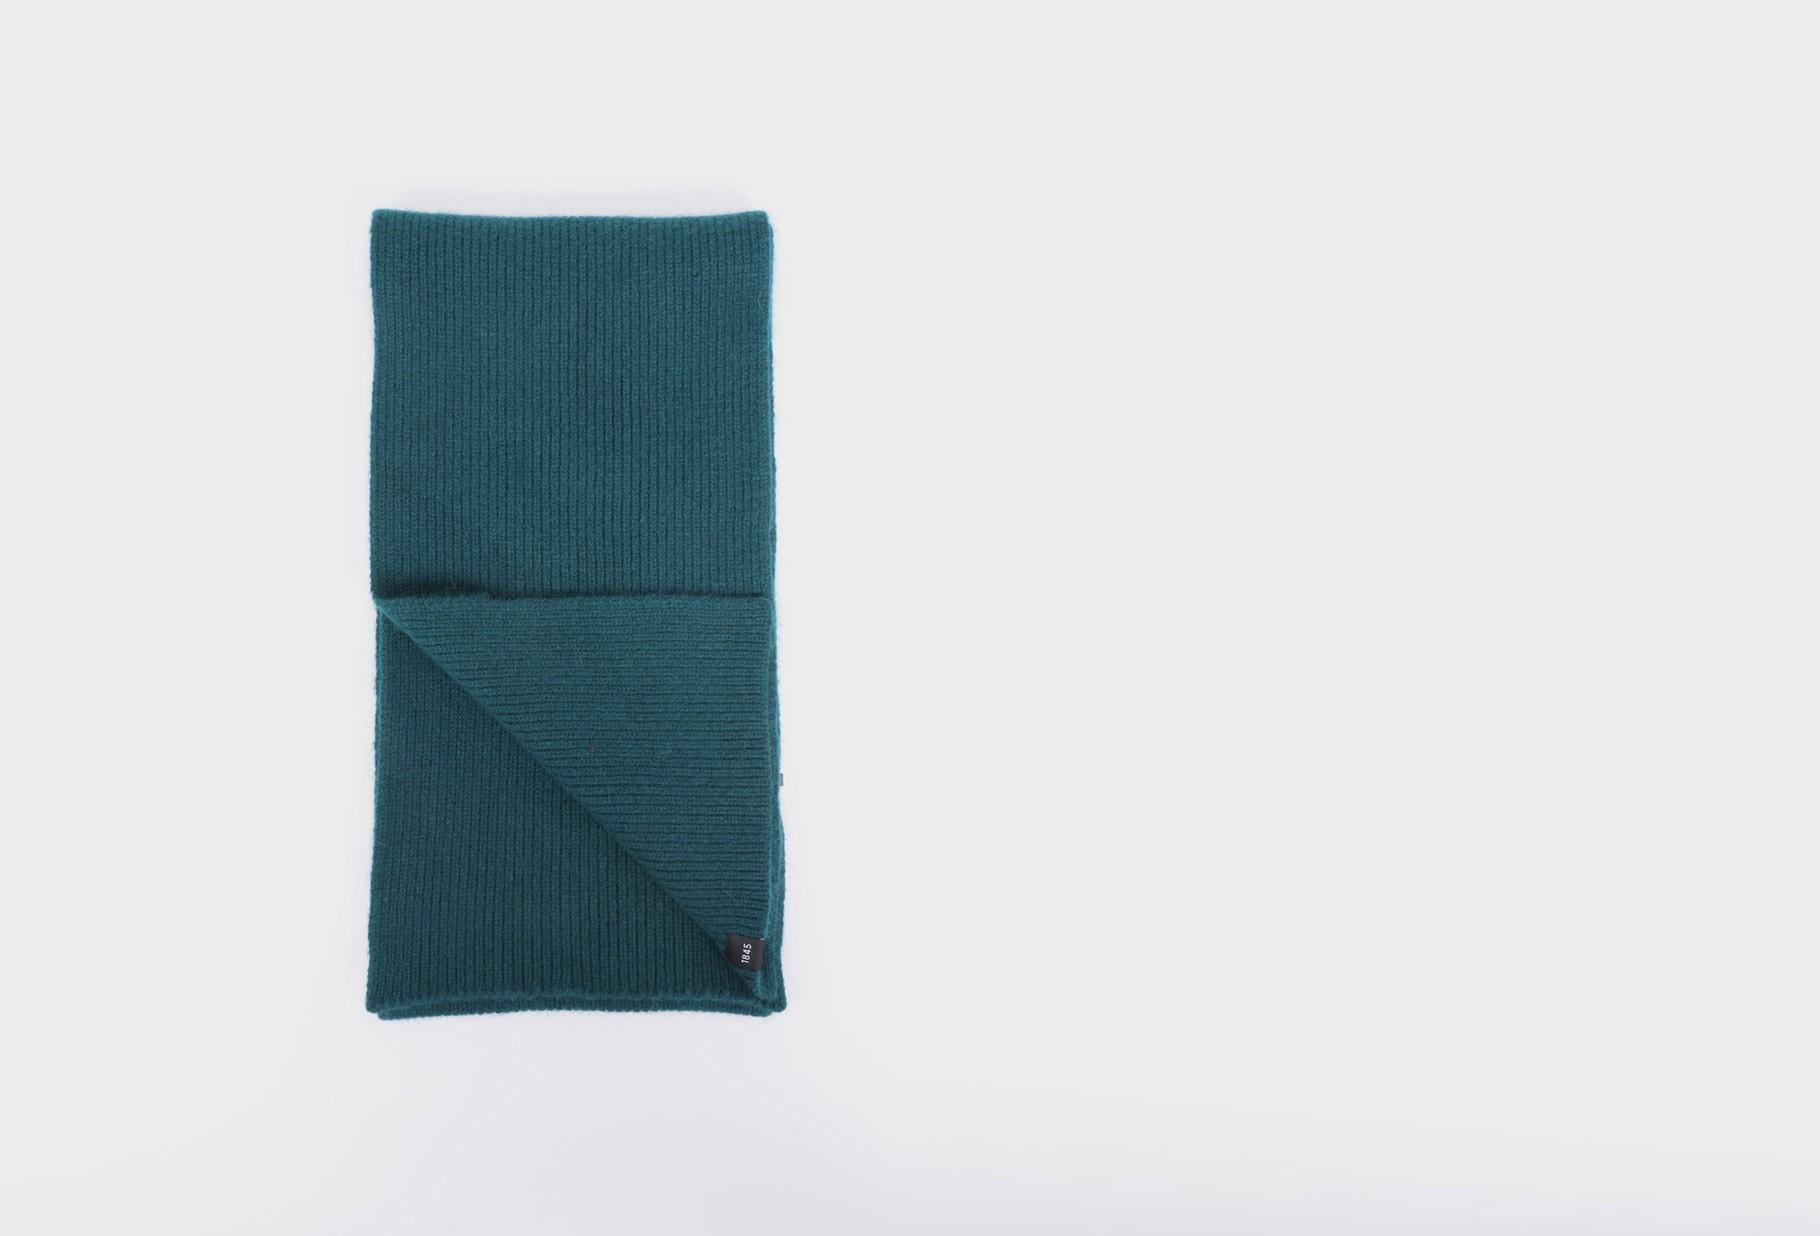 MACKIE / Barra scarf Spruce